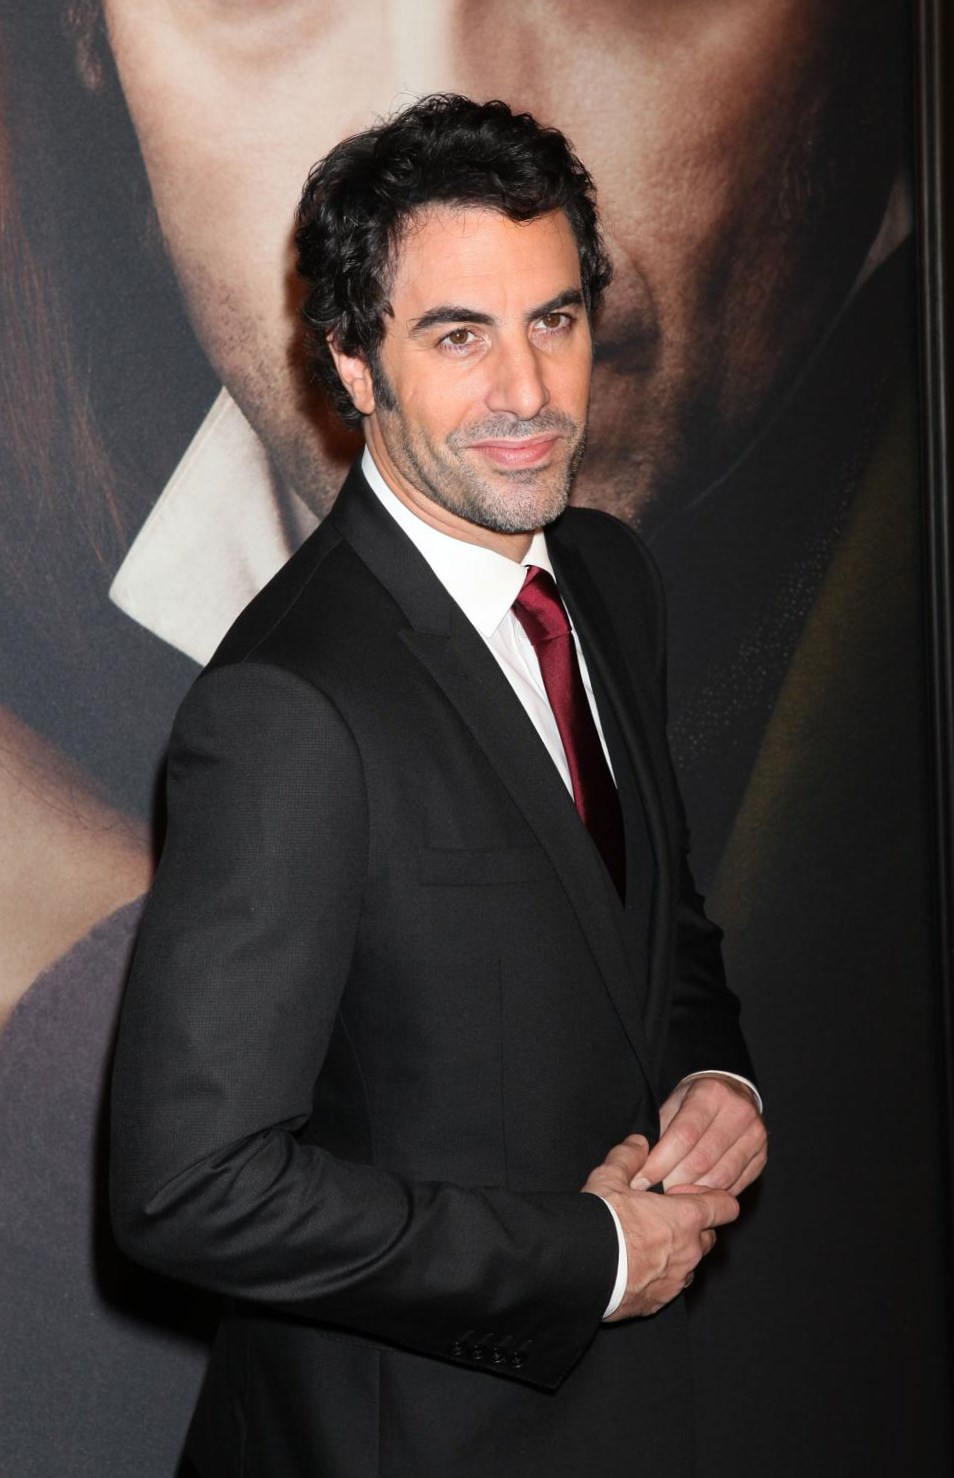 Sacha Noam Baron Cohen Net Worth - Salary, House, Car